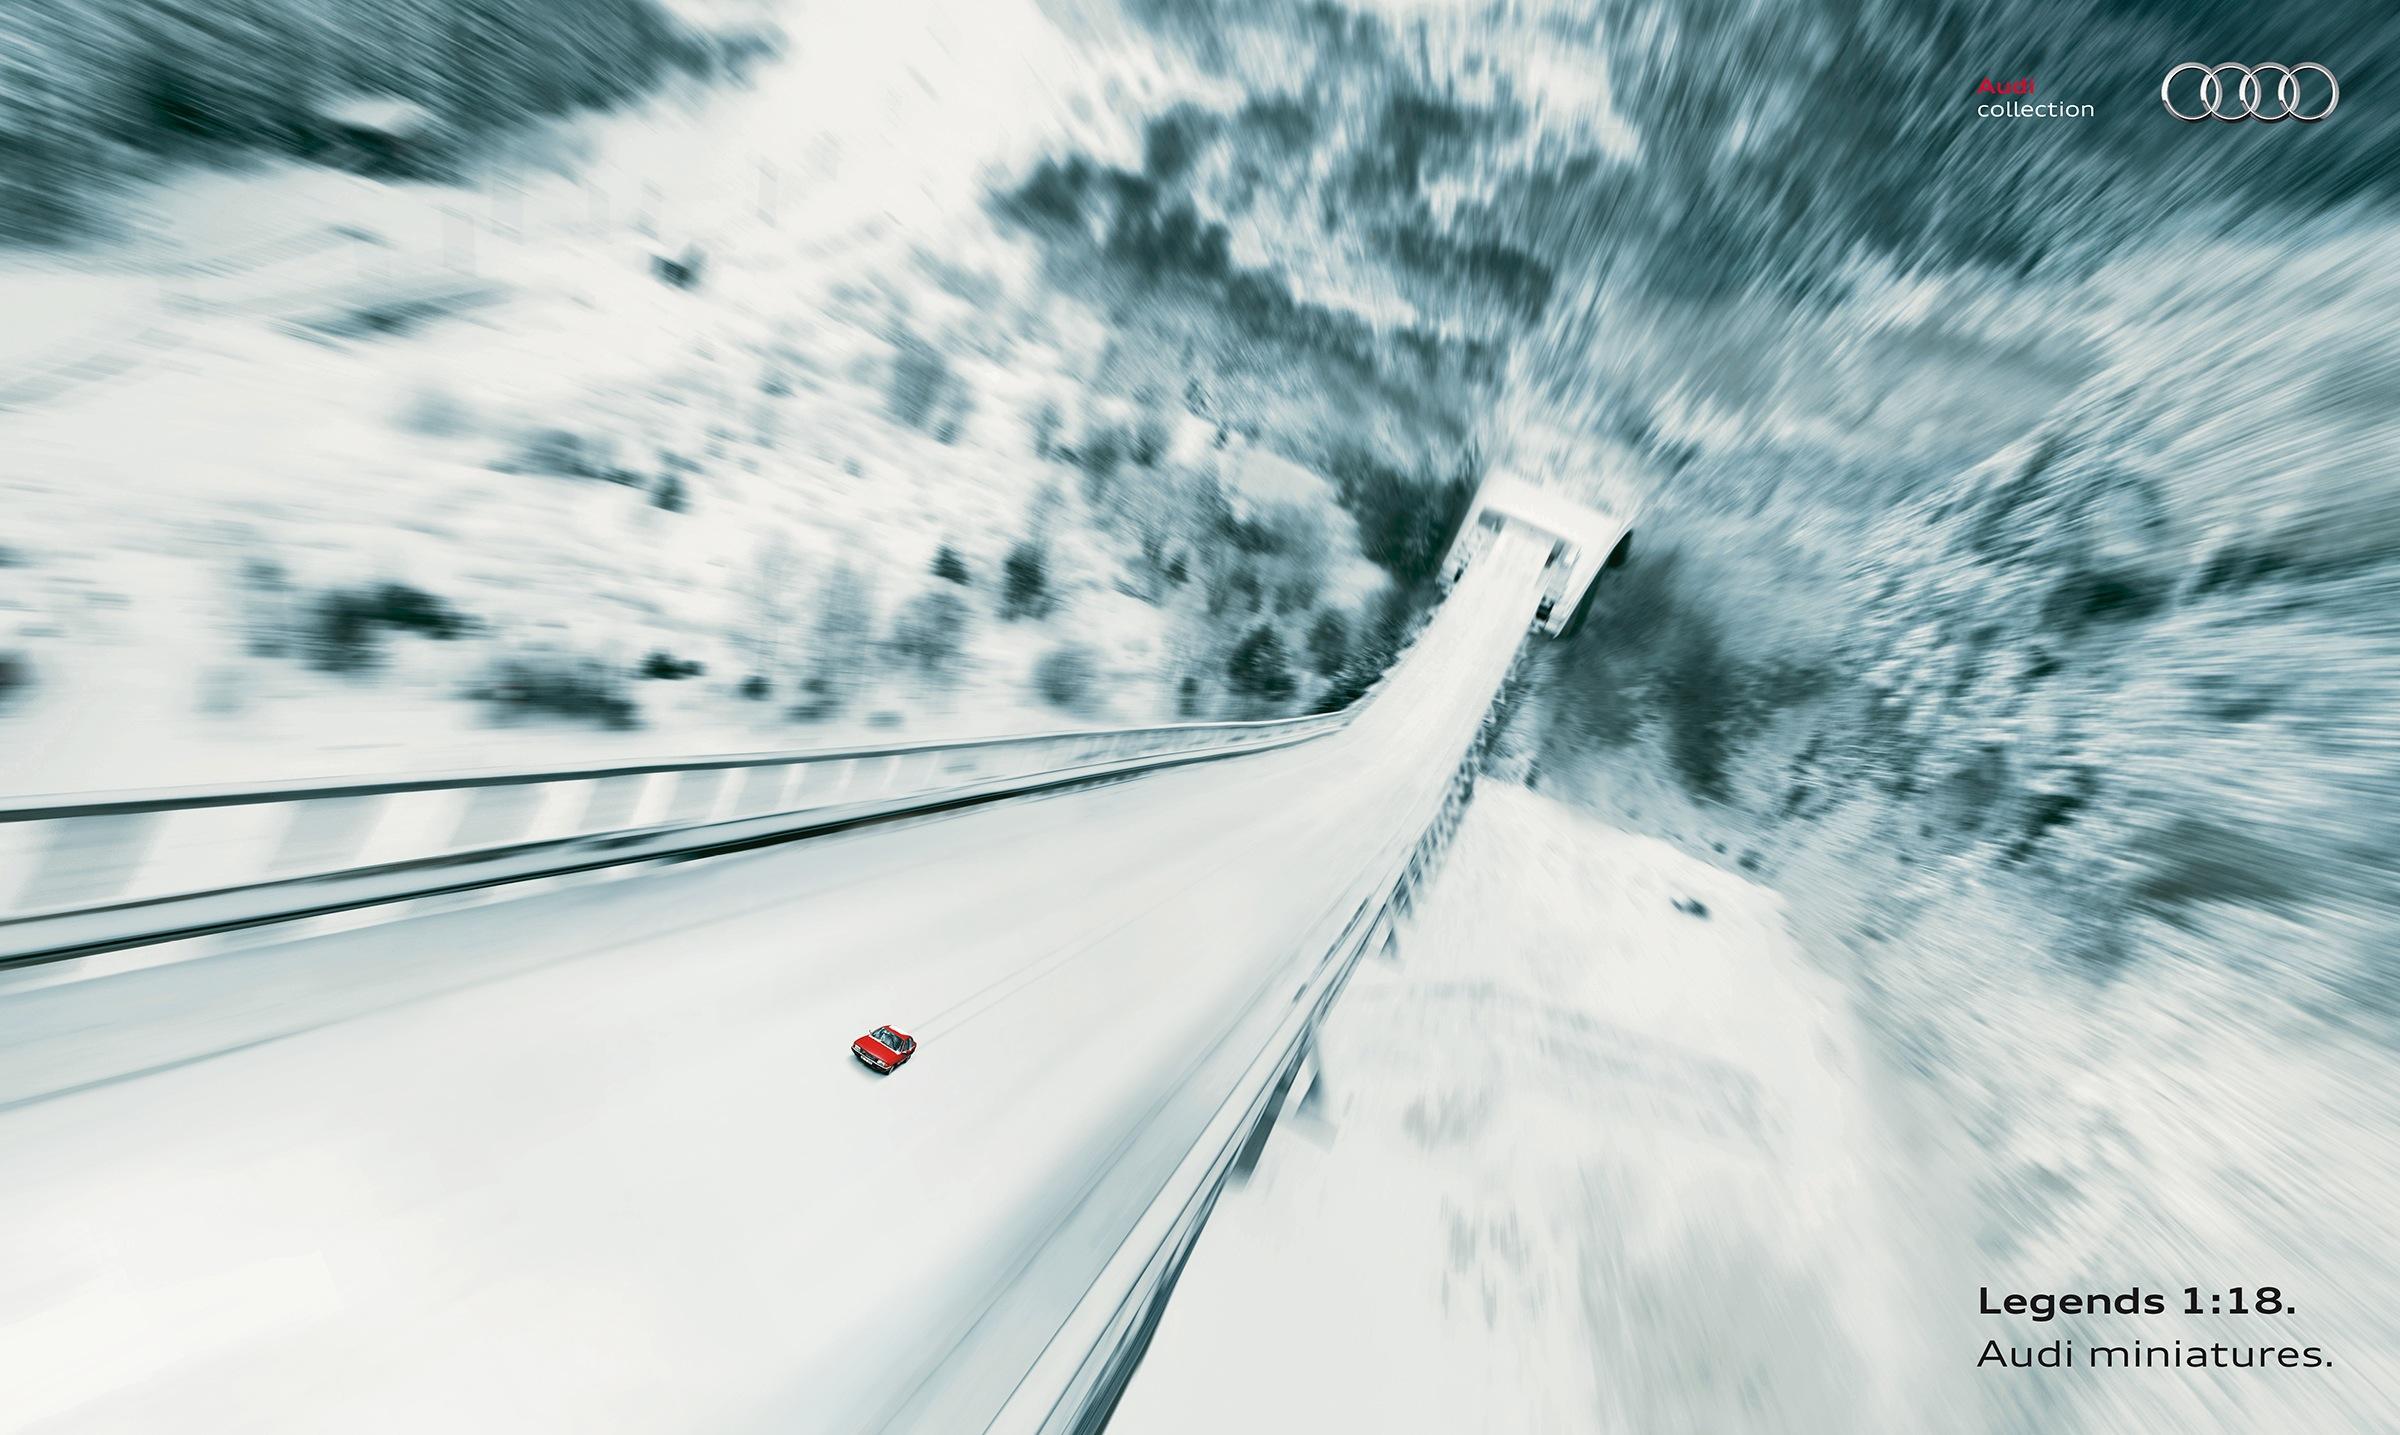 Audi Print Ad -  Ski jump